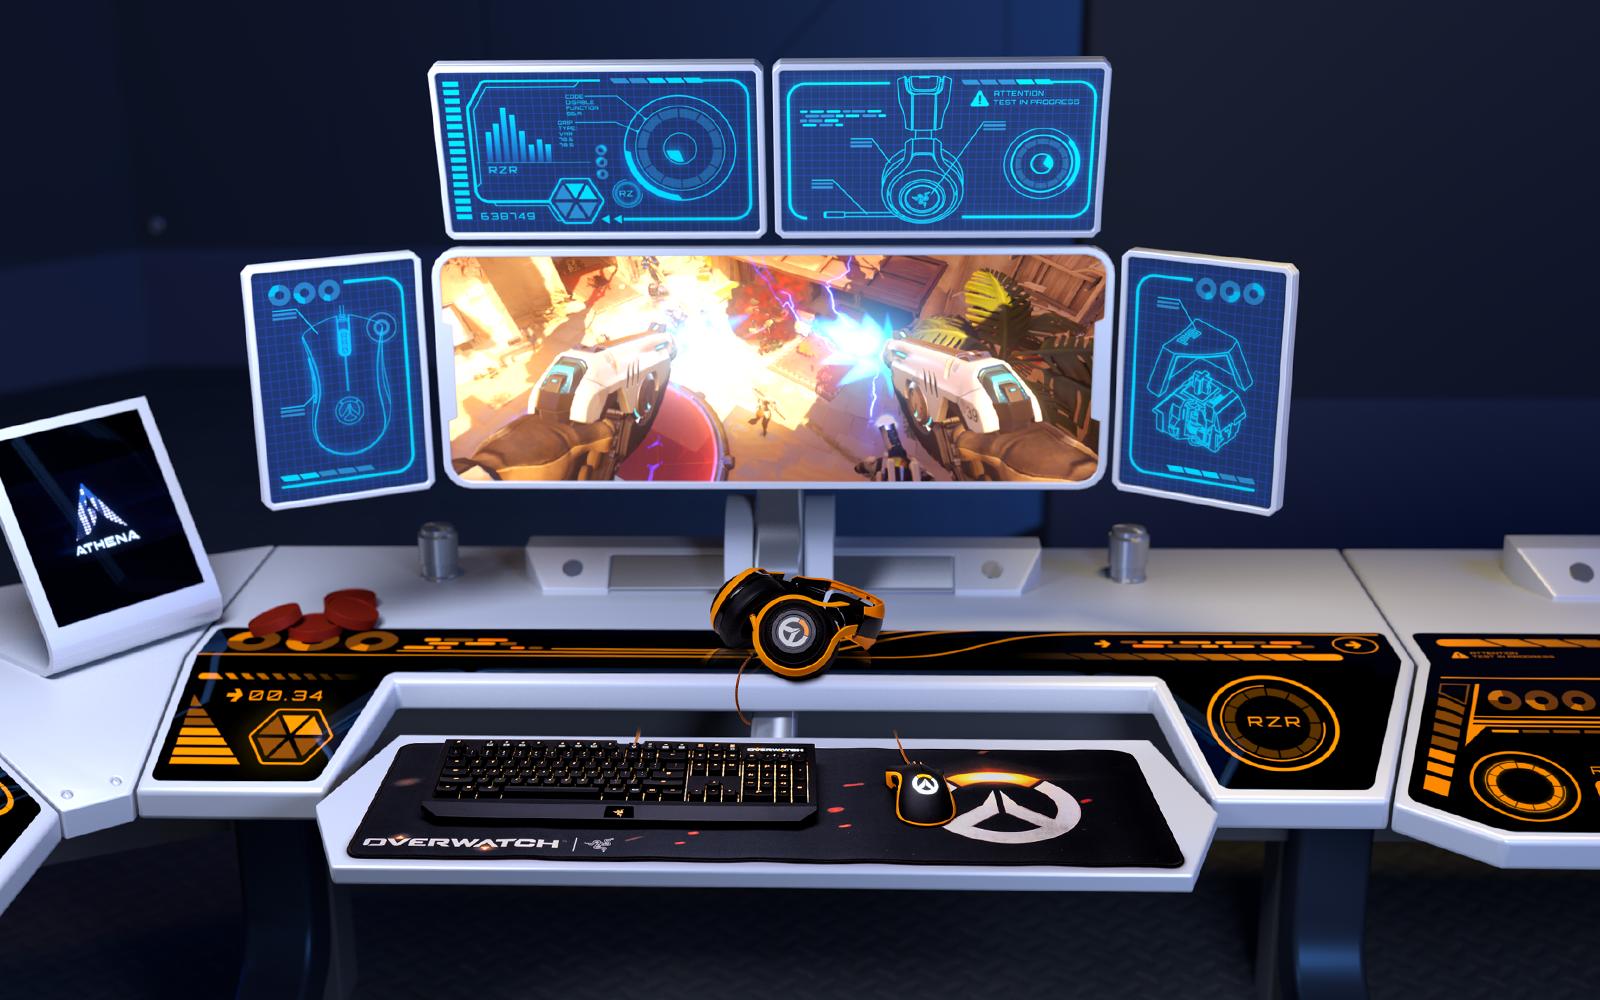 Overwatch Razer